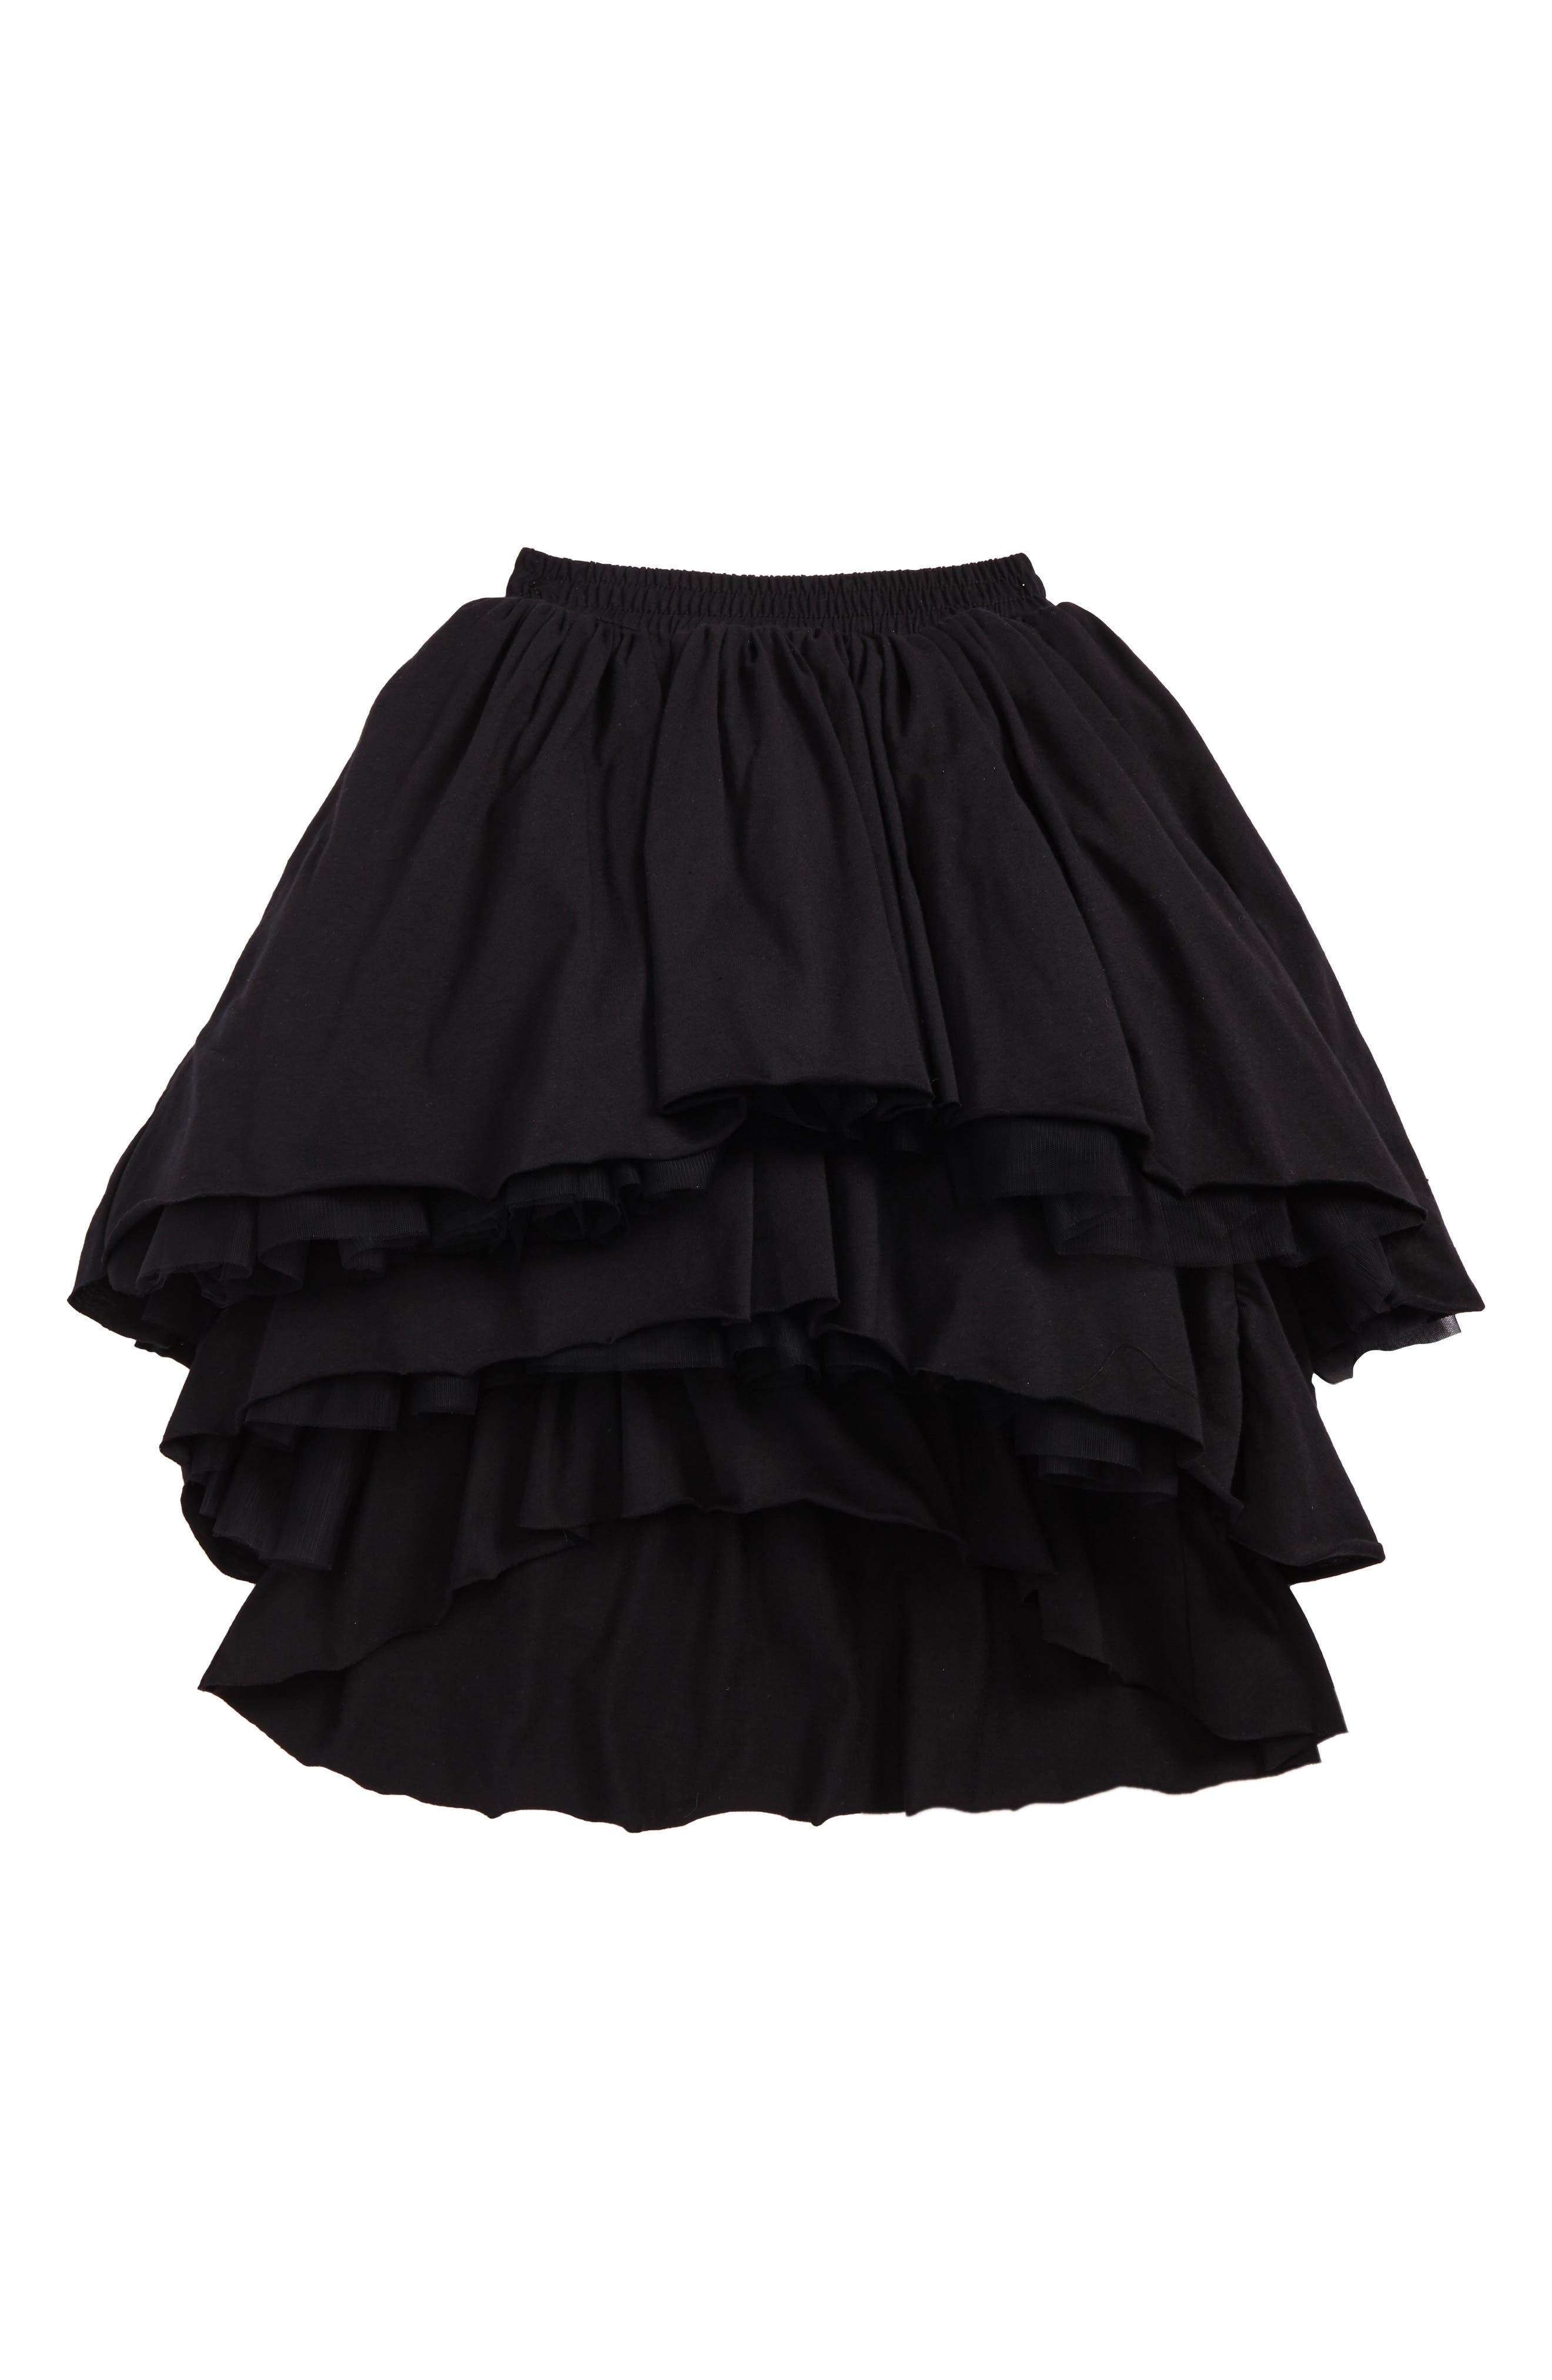 Layered Tulle Skirt,                             Main thumbnail 1, color,                             Black